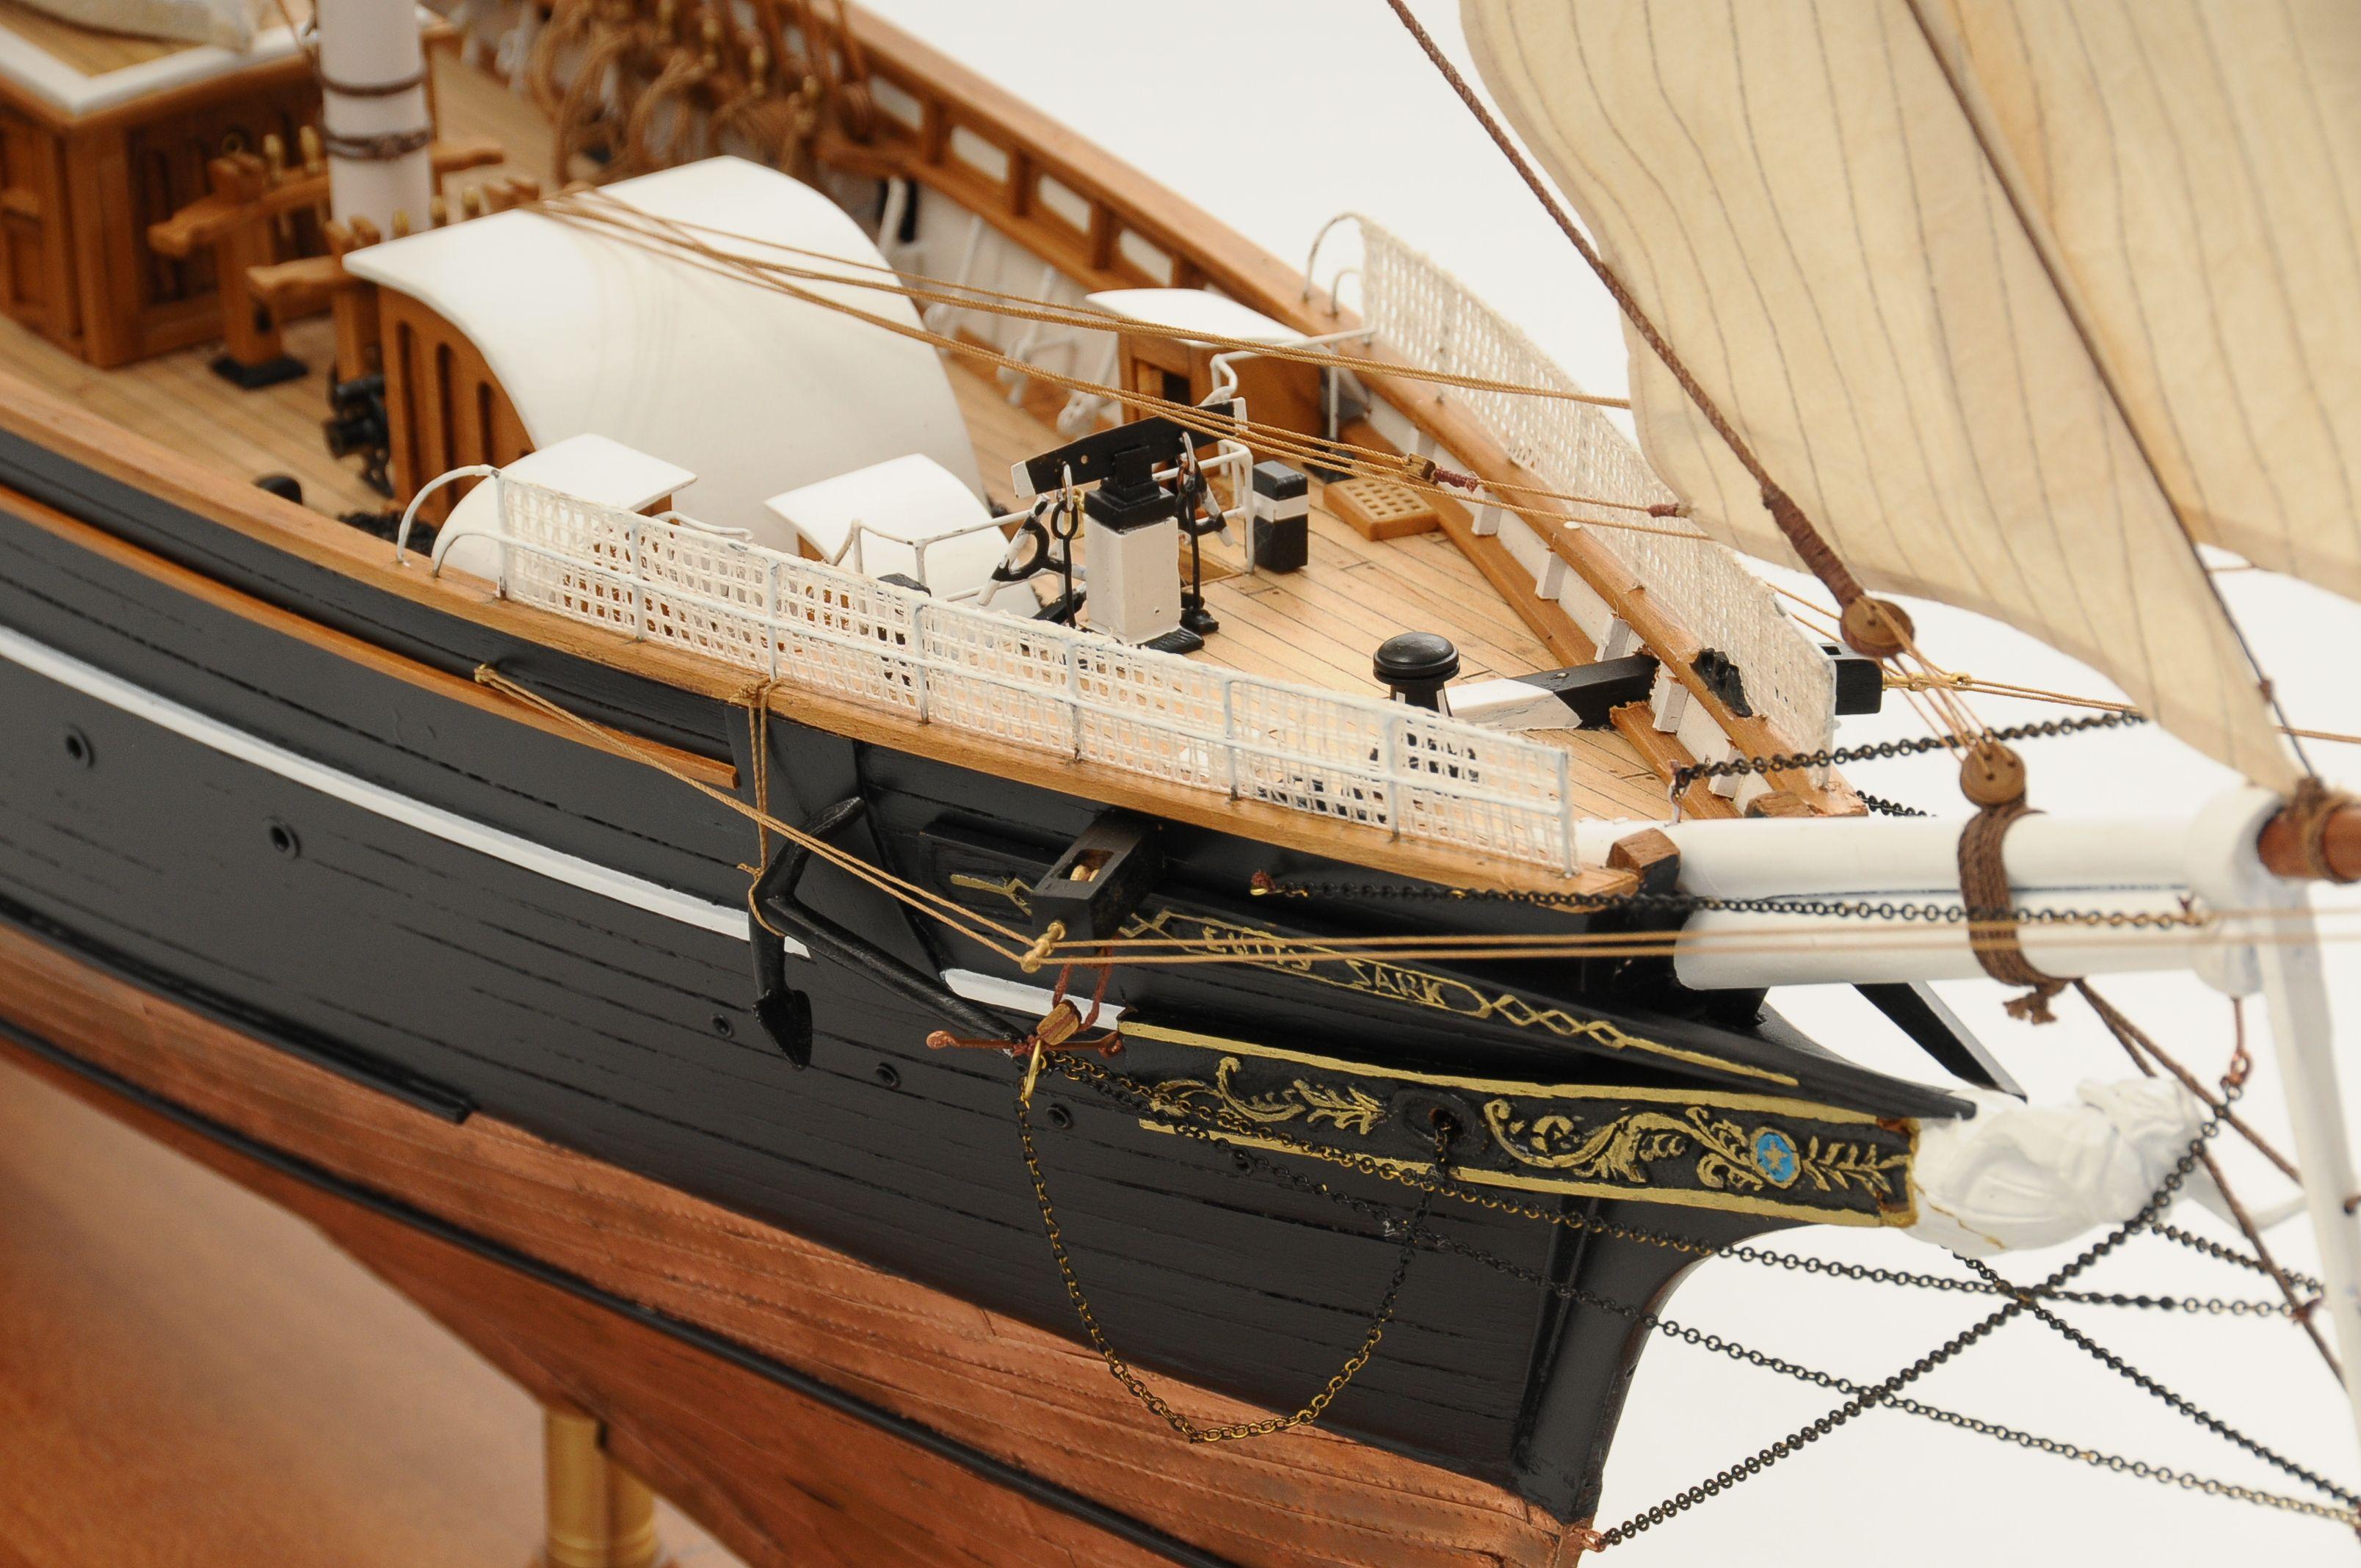 553-8666-Cutty-Sark-model-ship-Premier-Range